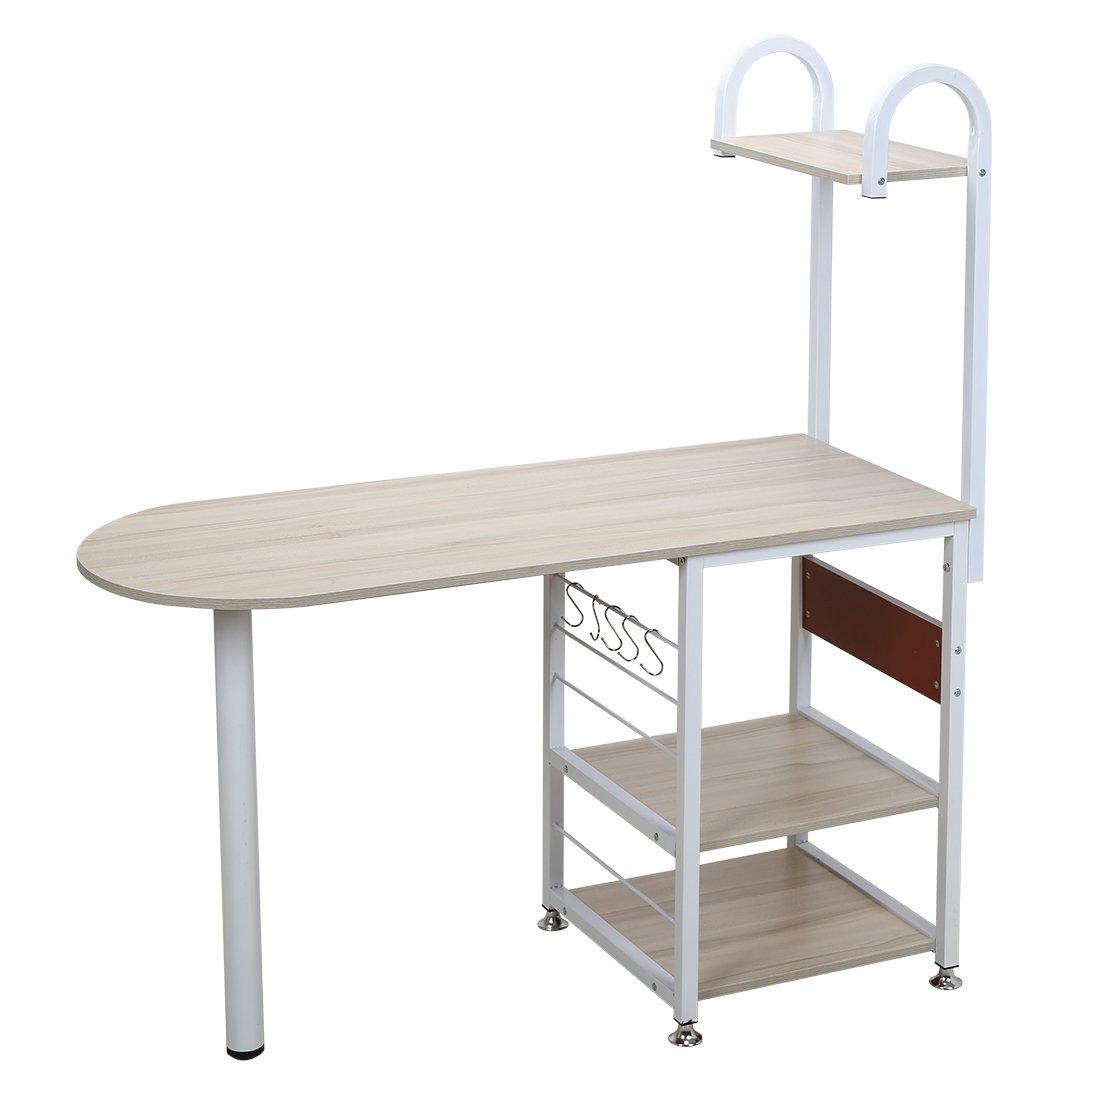 4 Tier Multipurpose Storage Shelf Bakers Rack, Metal Frame and Wooden Worktop for Kitchen by BestValue GO (Image #3)